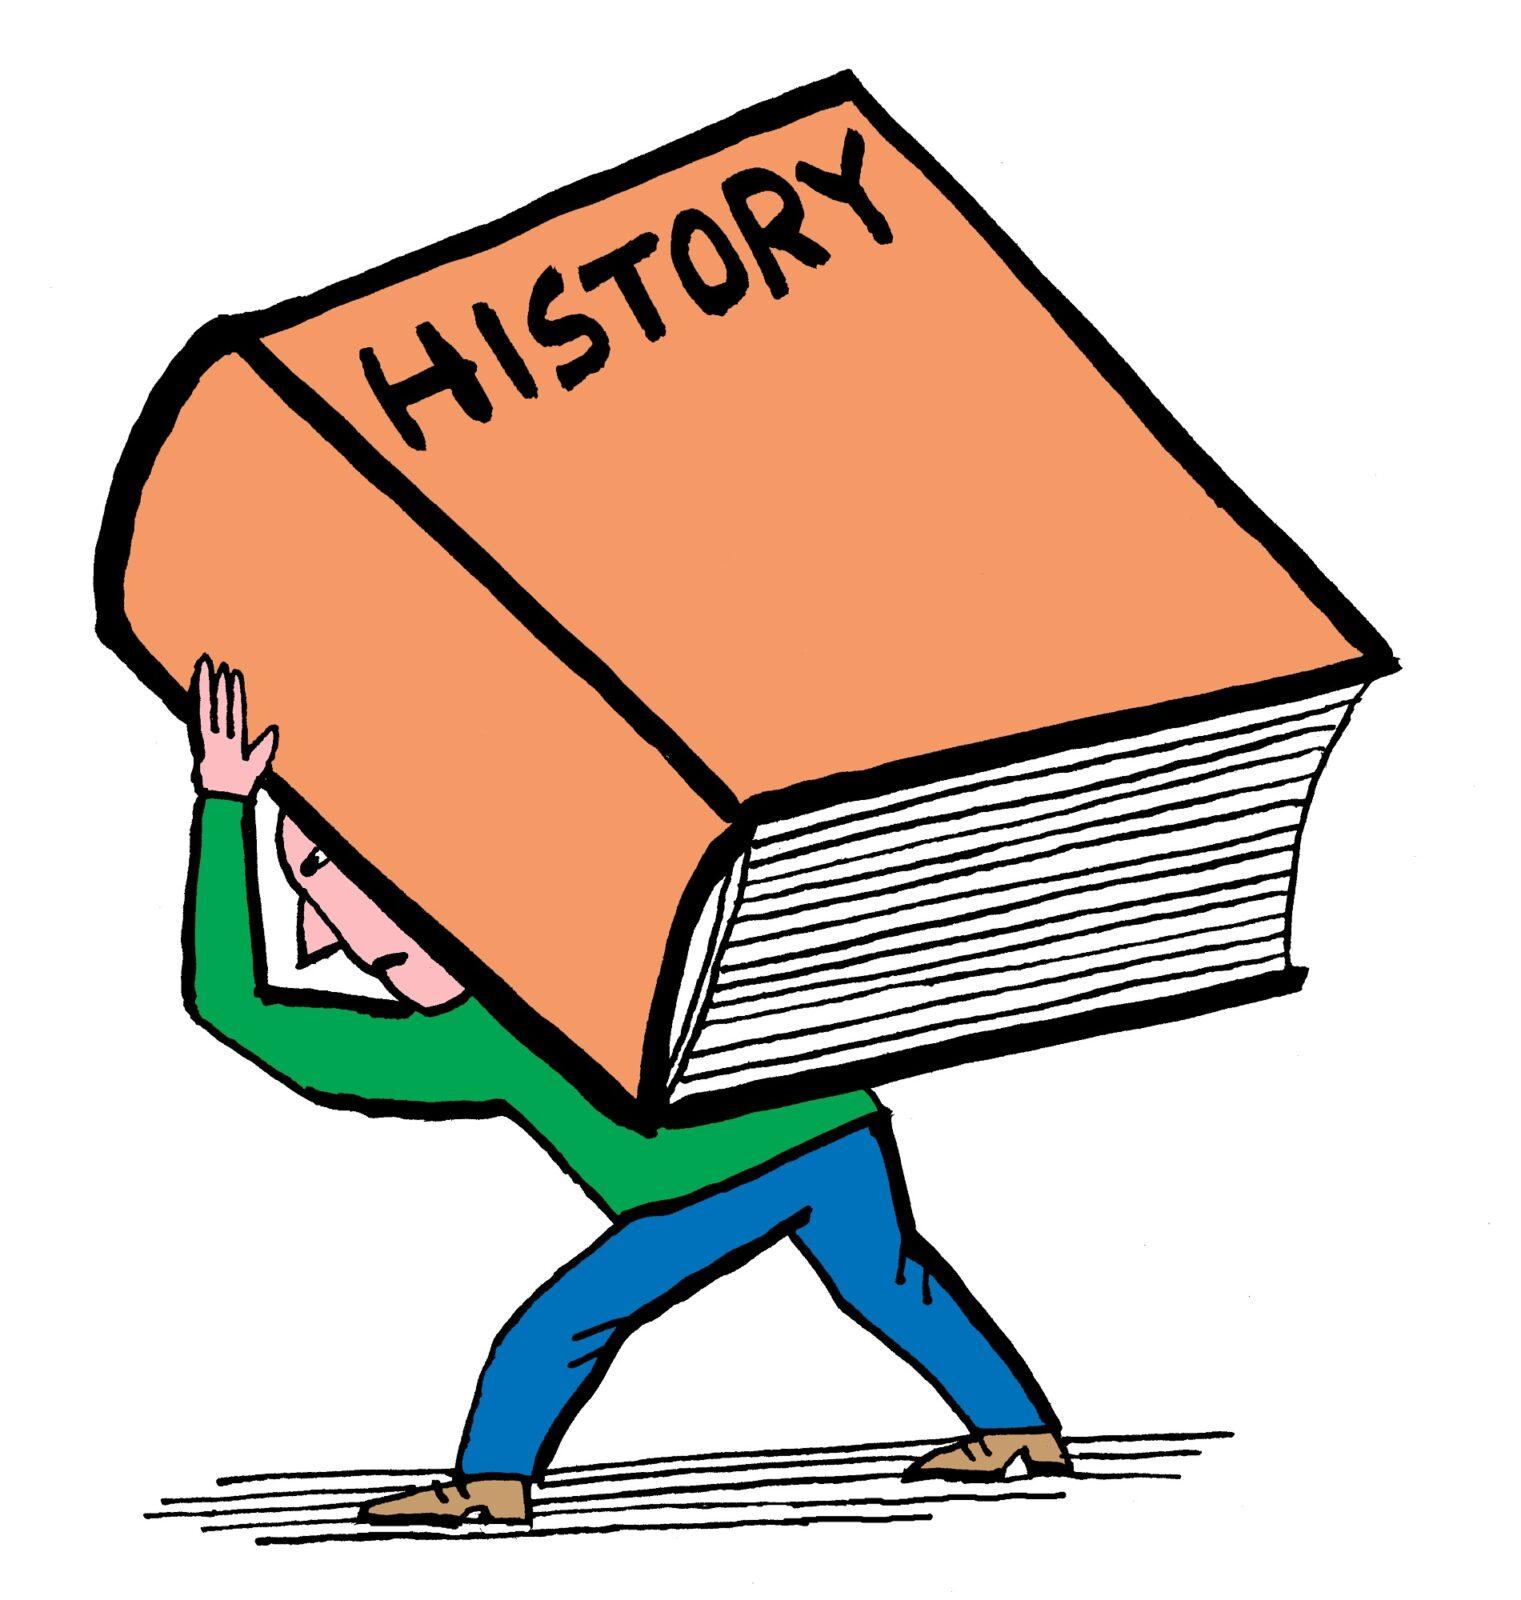 em-geschiedenis boek slavernij-eng